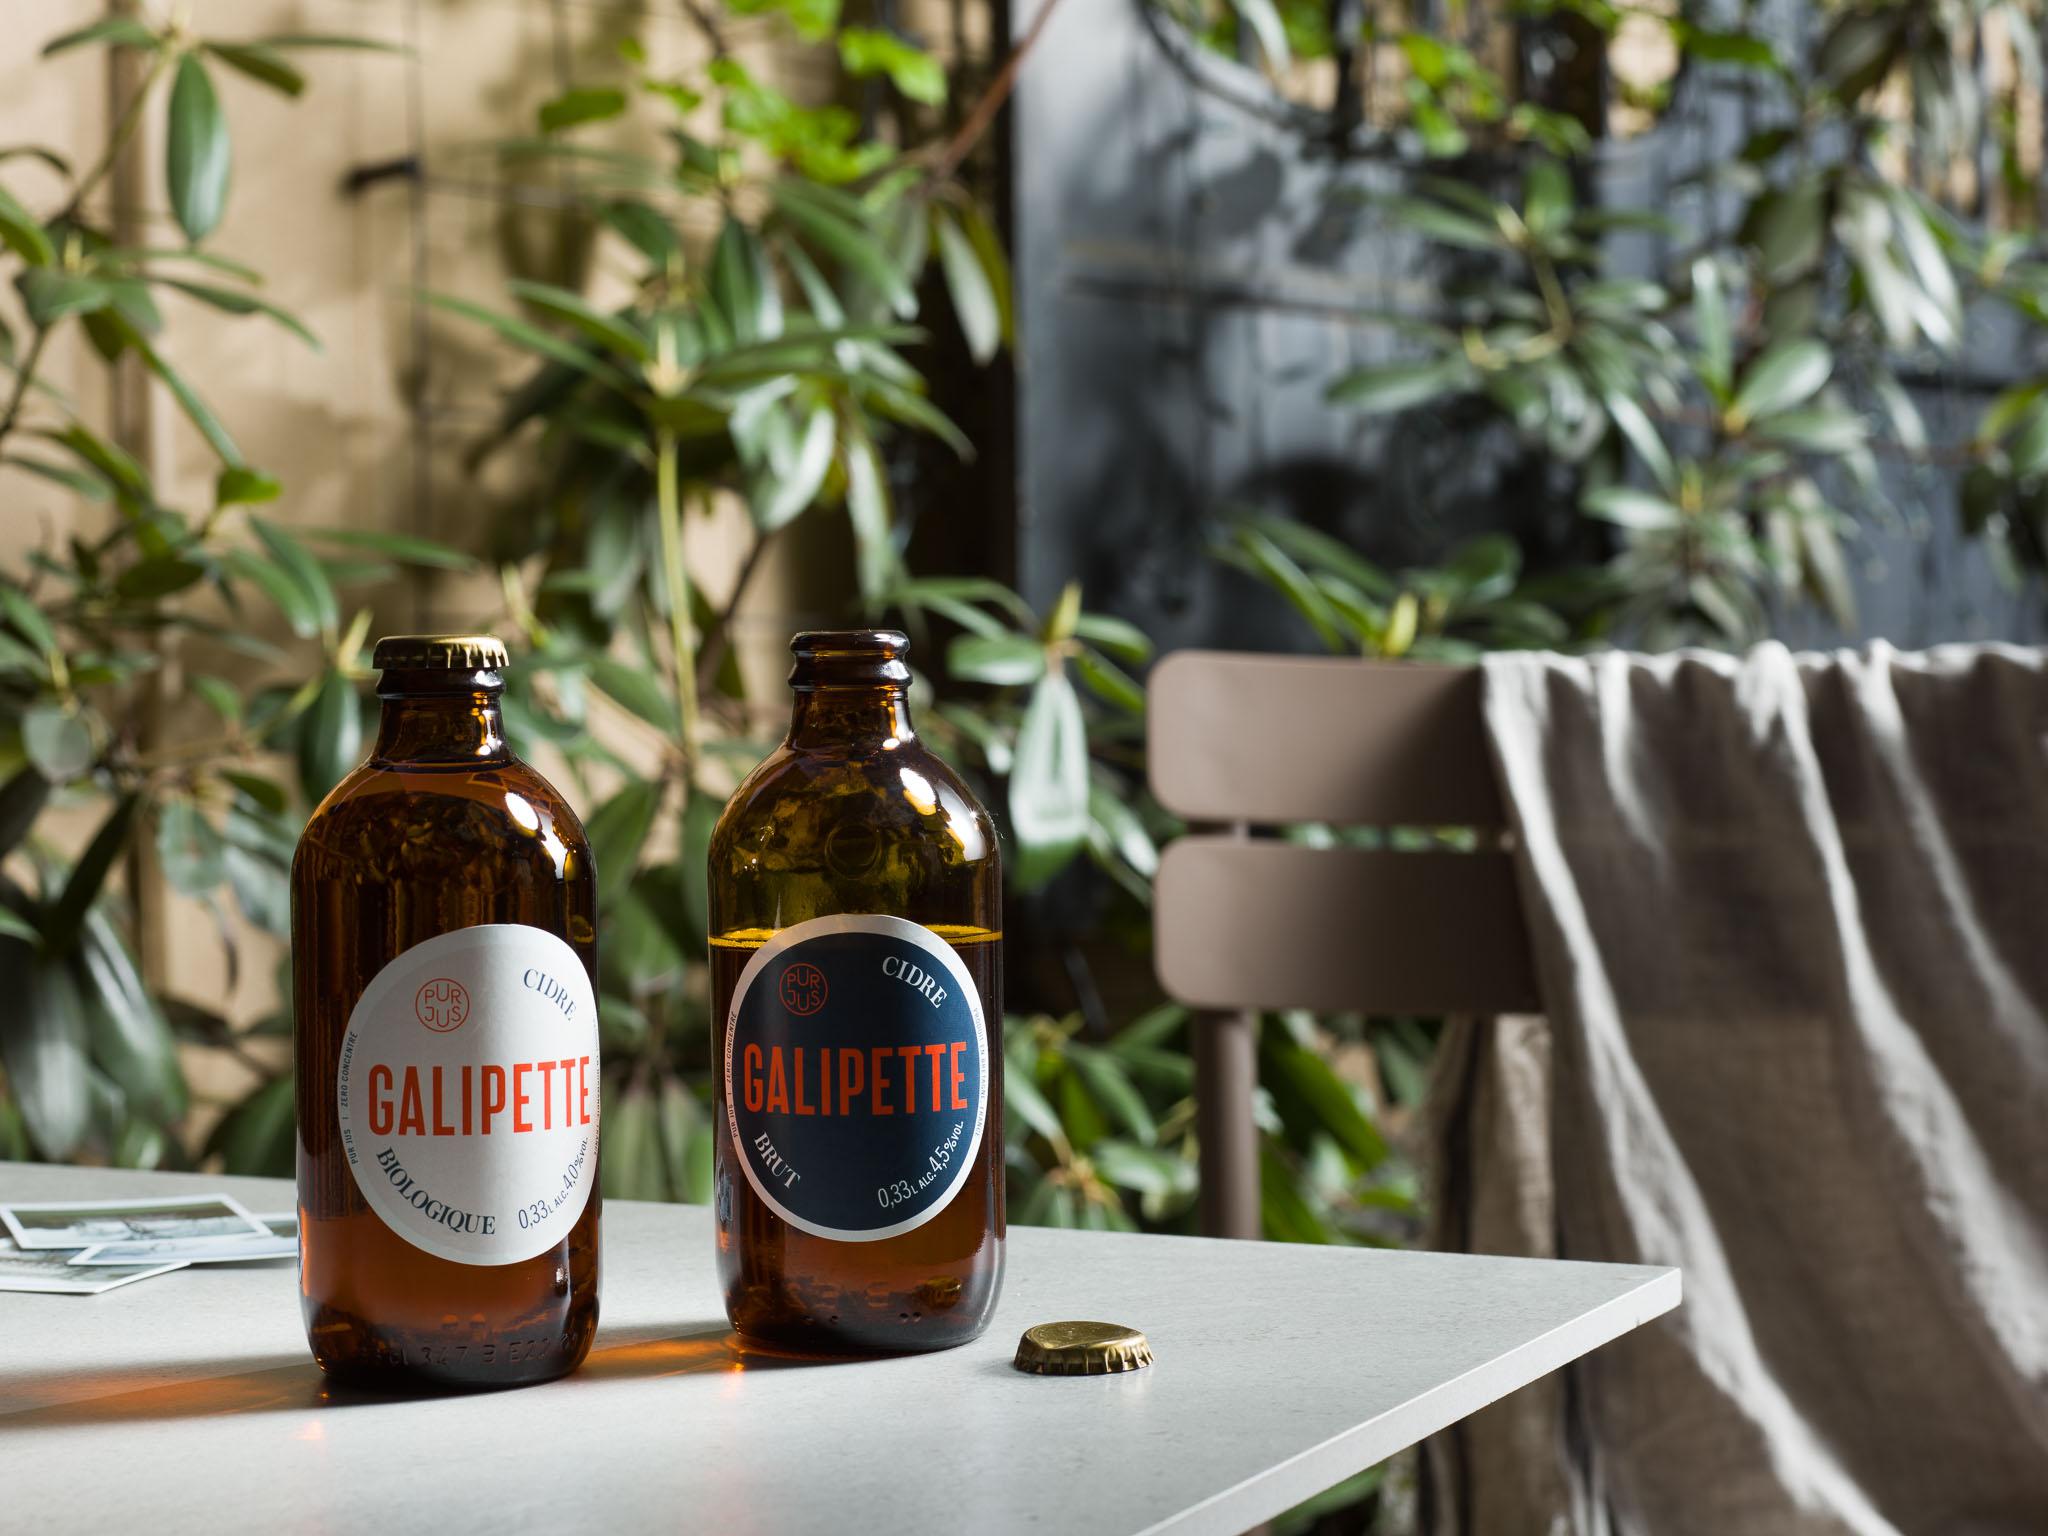 Galipette Cidre Expands into China